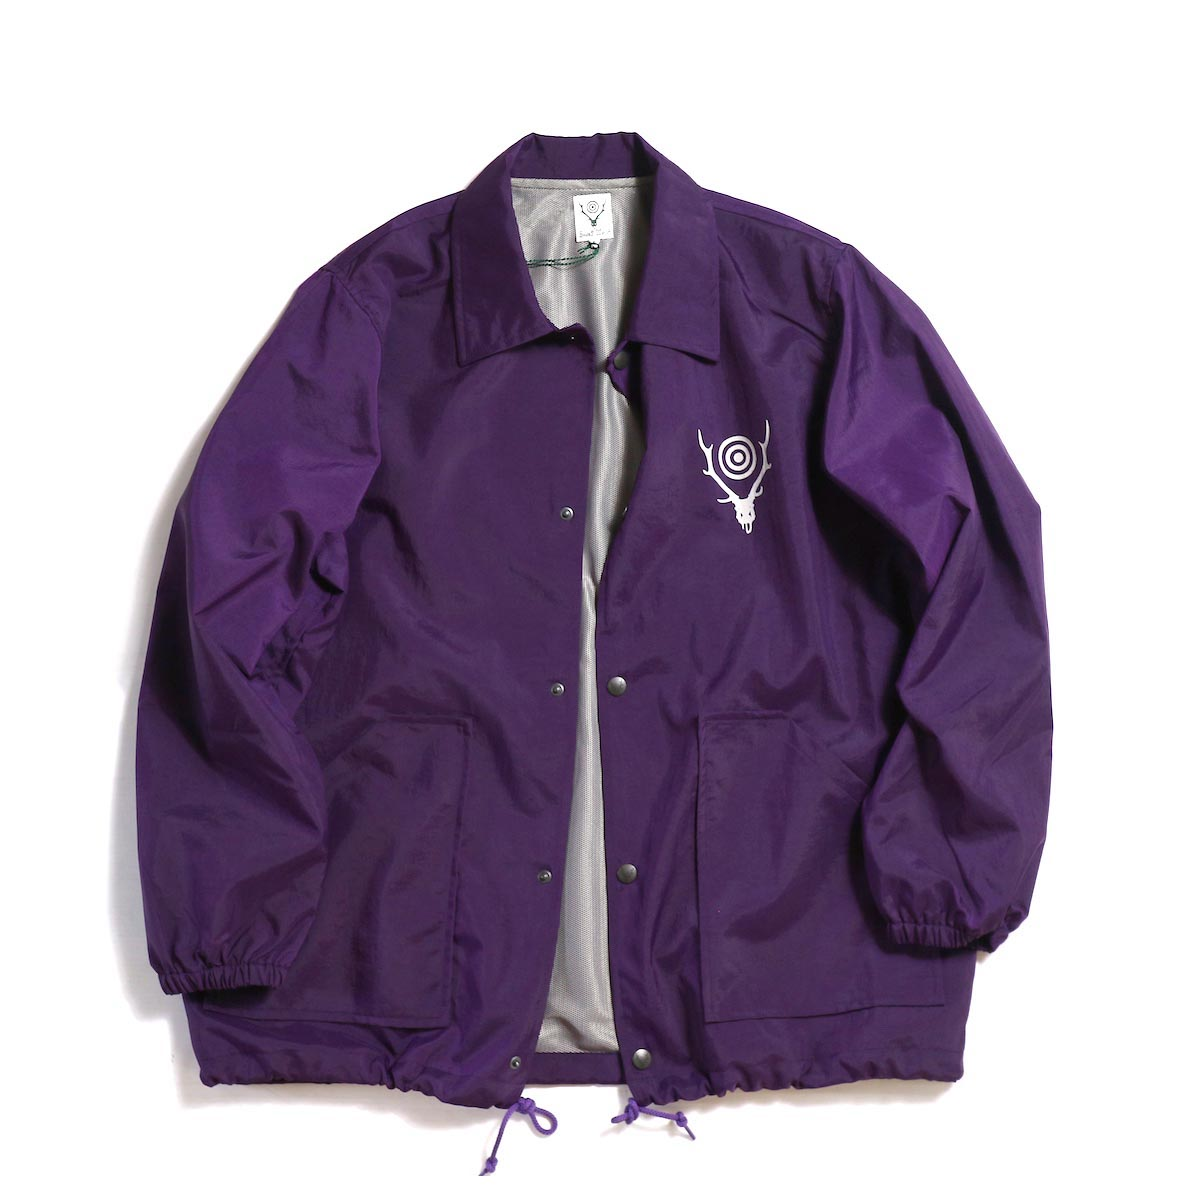 SOUTH2 WEST8 / Coach Jacket -Nylon Taffeta/Acrylic Coating -Purple